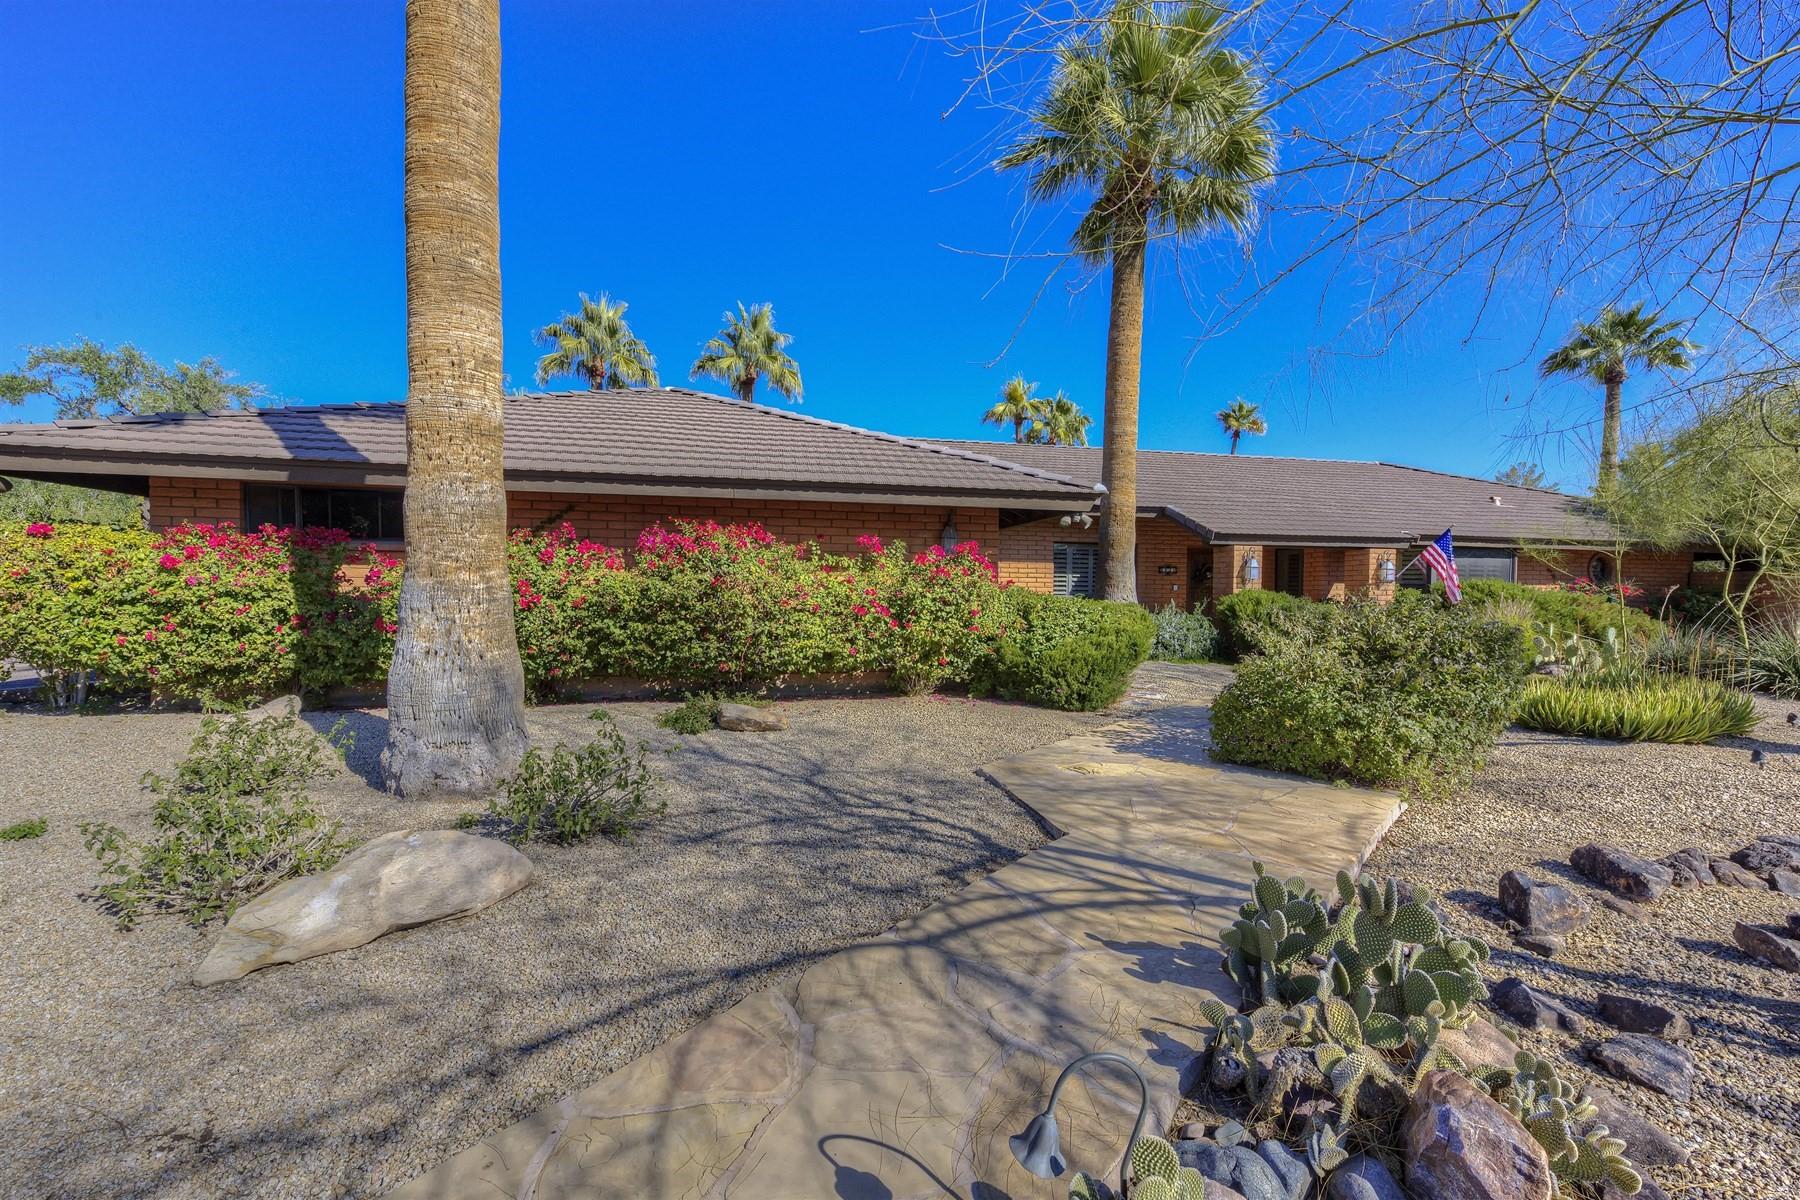 獨棟家庭住宅 為 出售 在 Gracious Paradise Valley home 3930 E Rancho Dr Paradise Valley, 亞利桑那州, 85253 美國